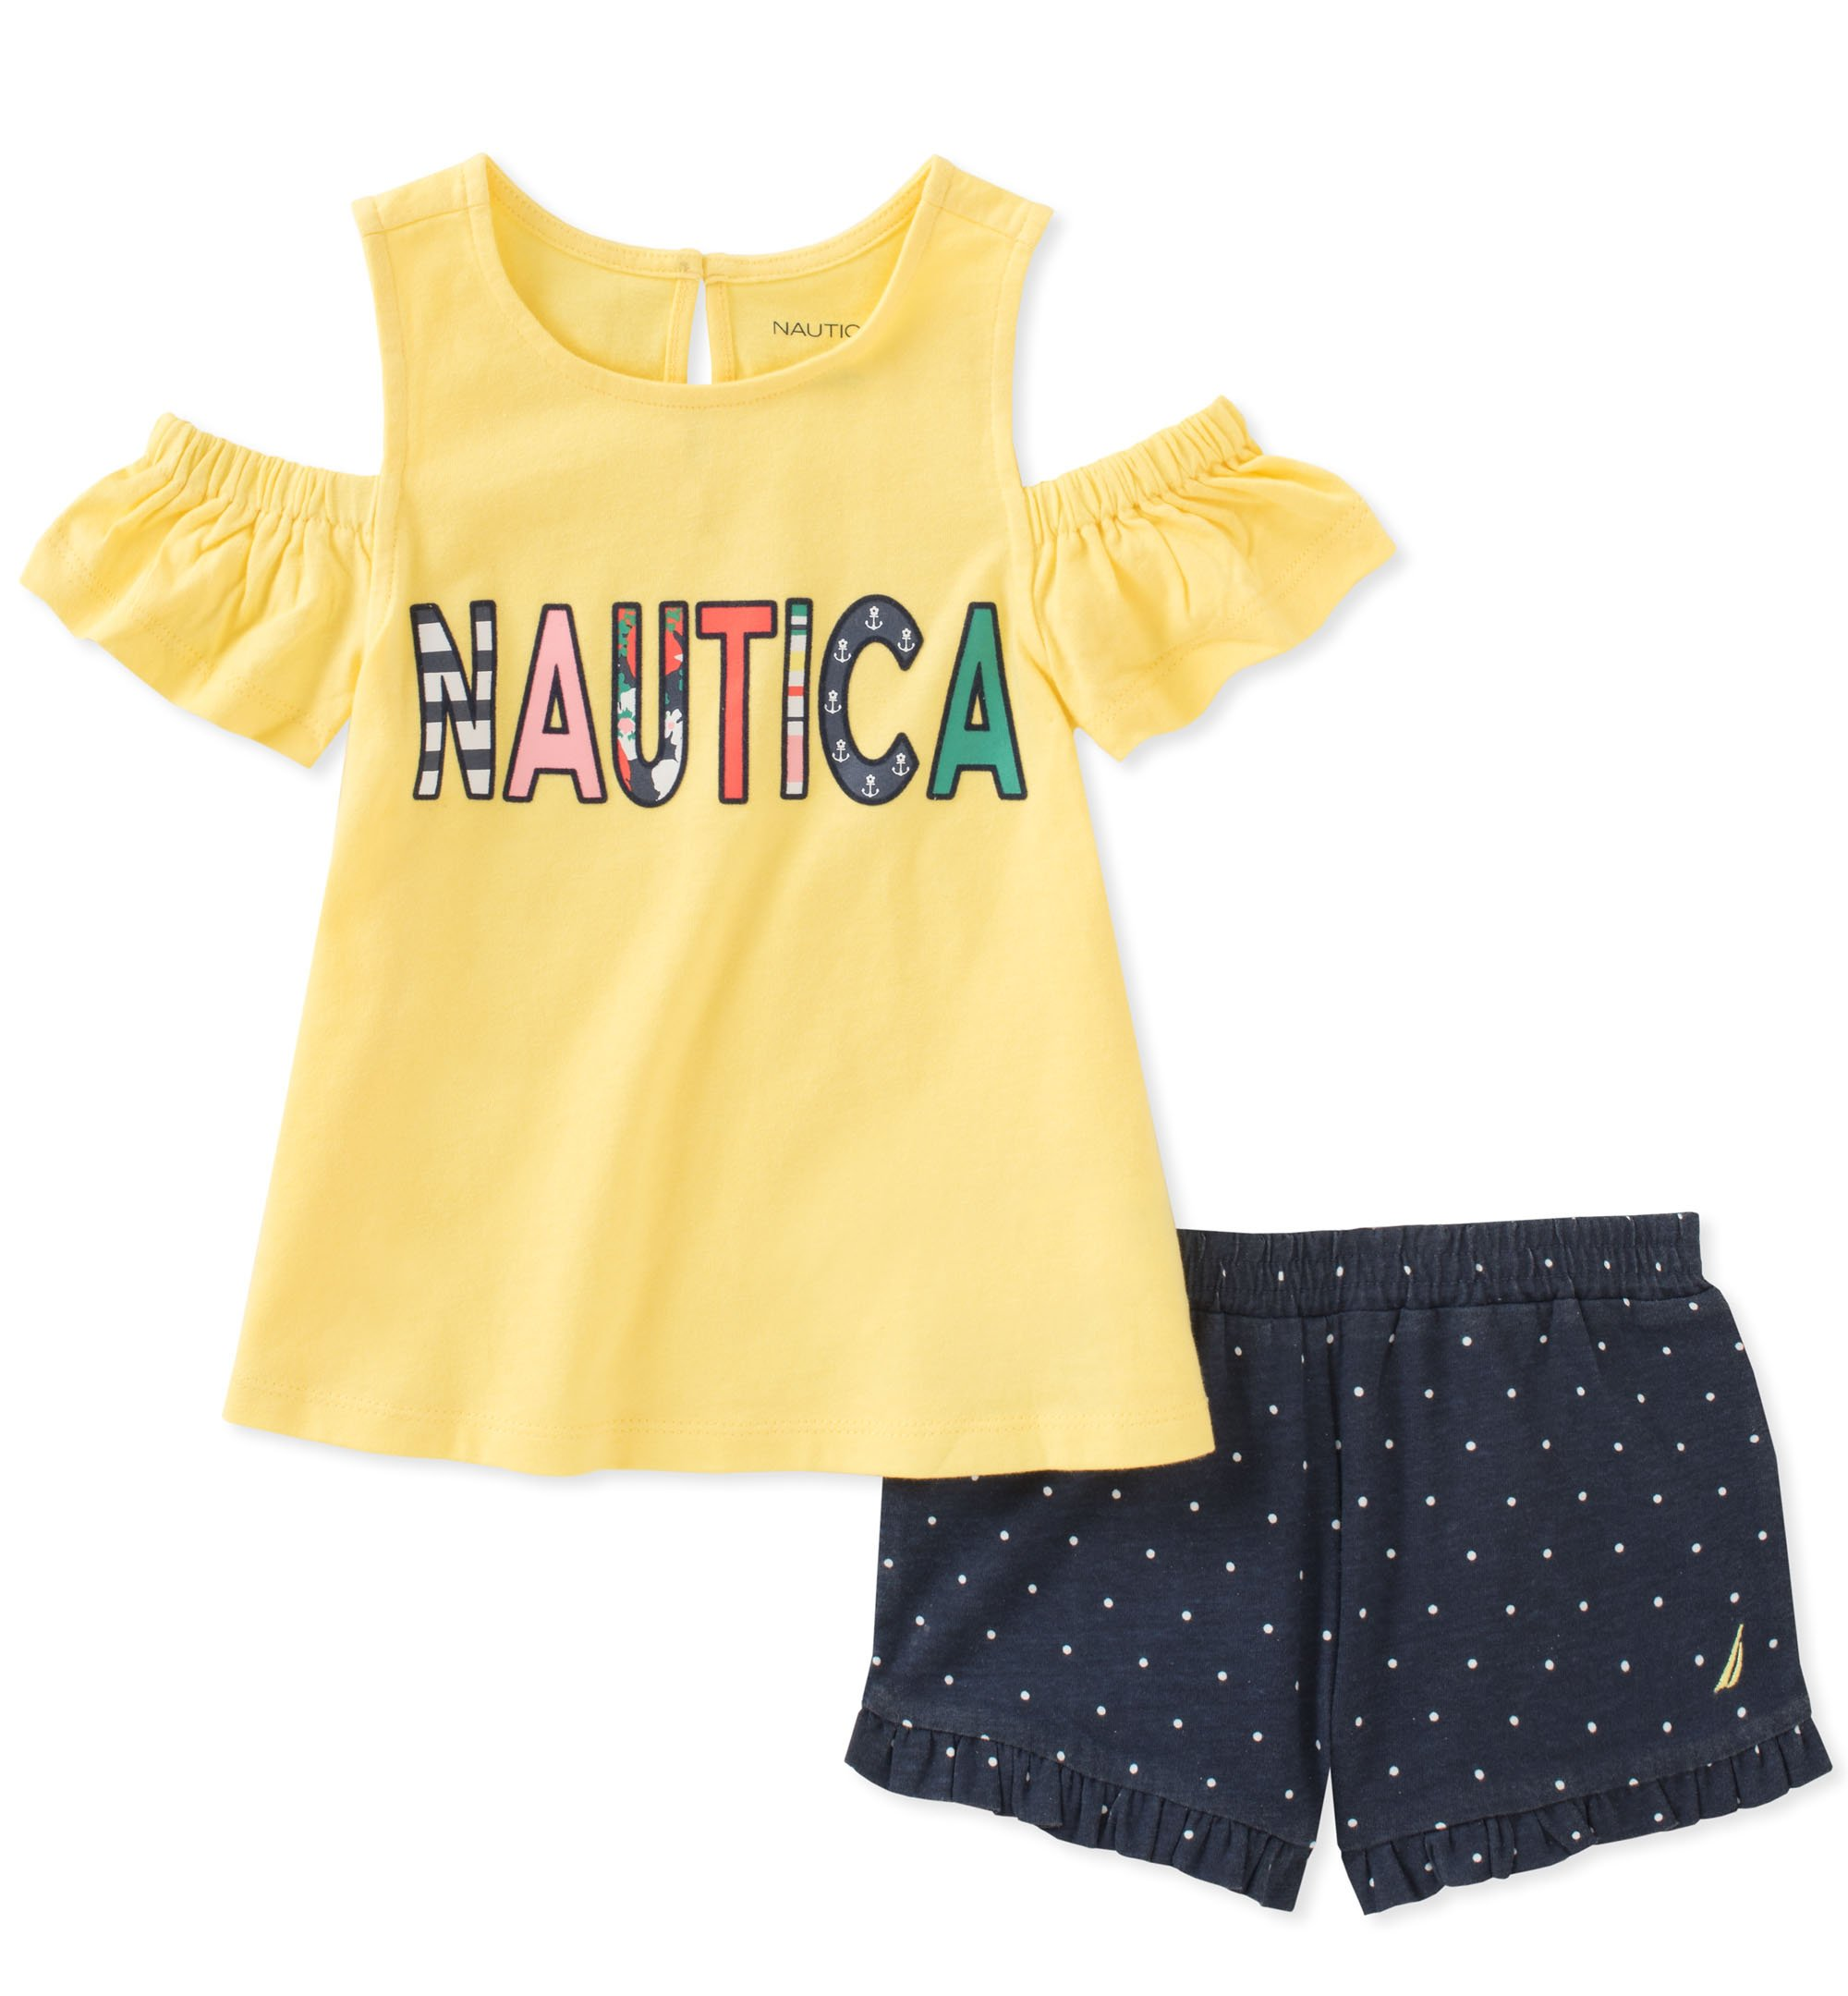 Nautica Toddler Girls' Shorts Set, Yellow/Navy, 4T